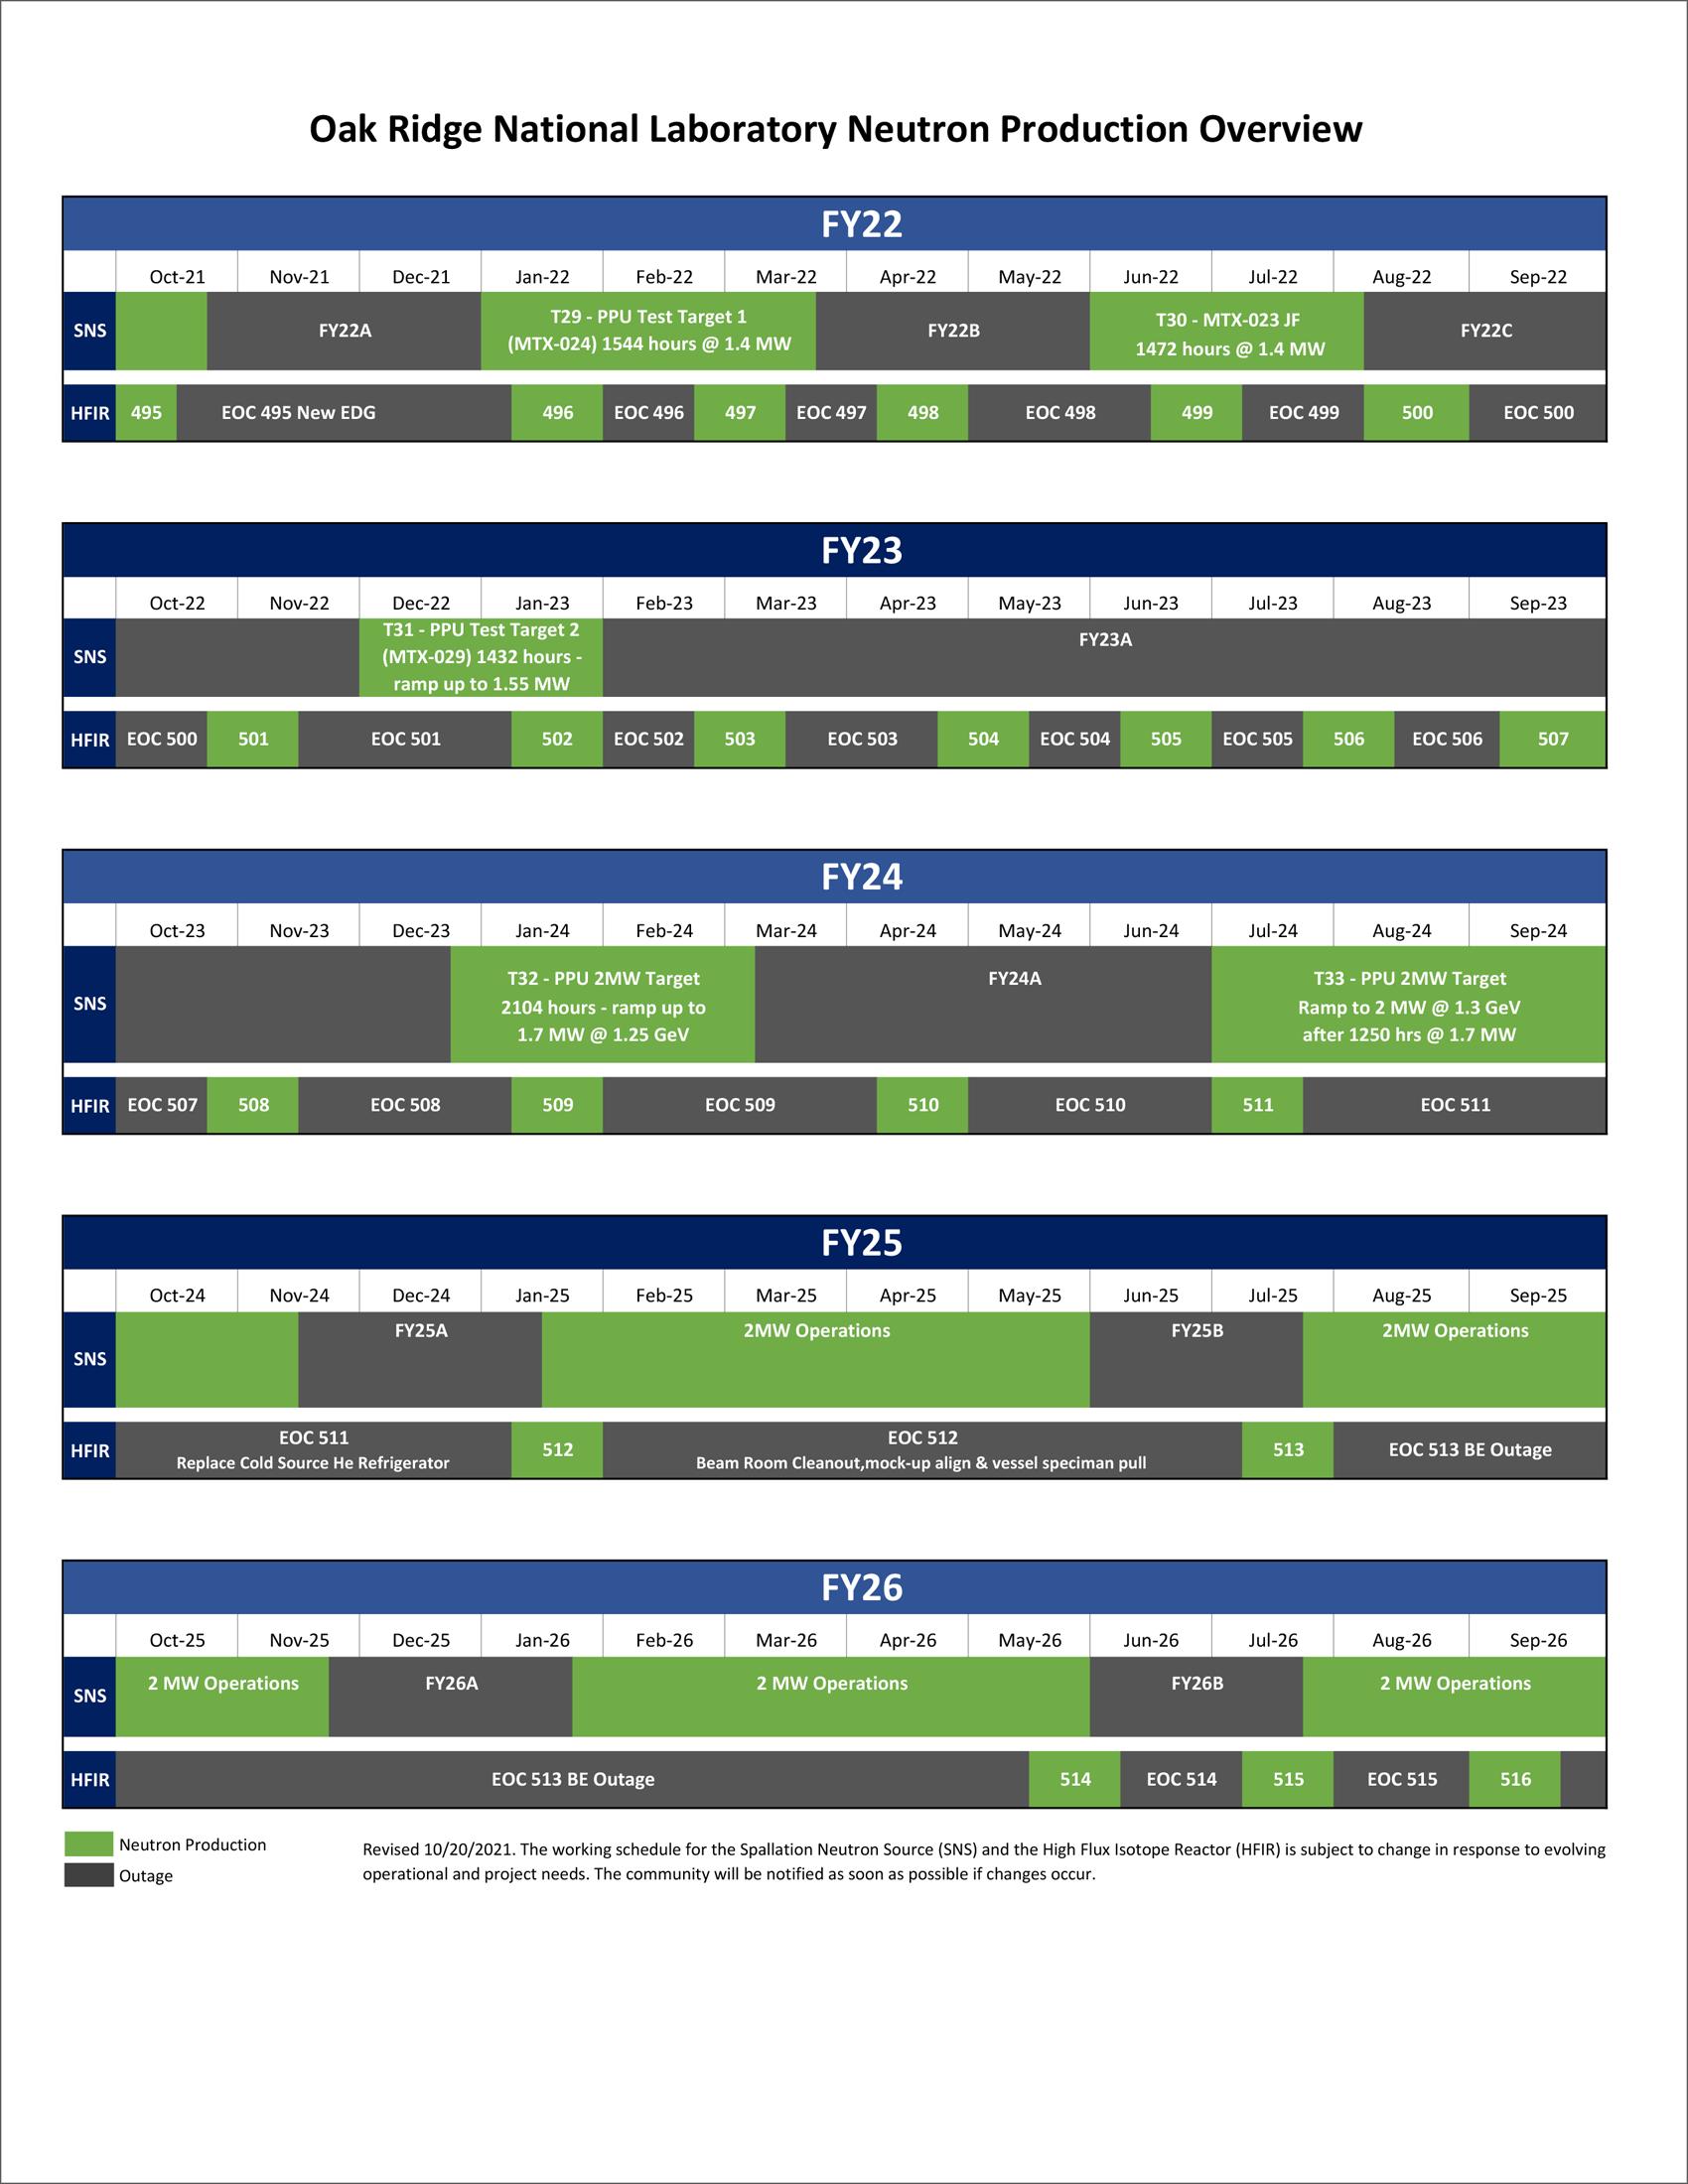 SNS & HFIR 5-year overview